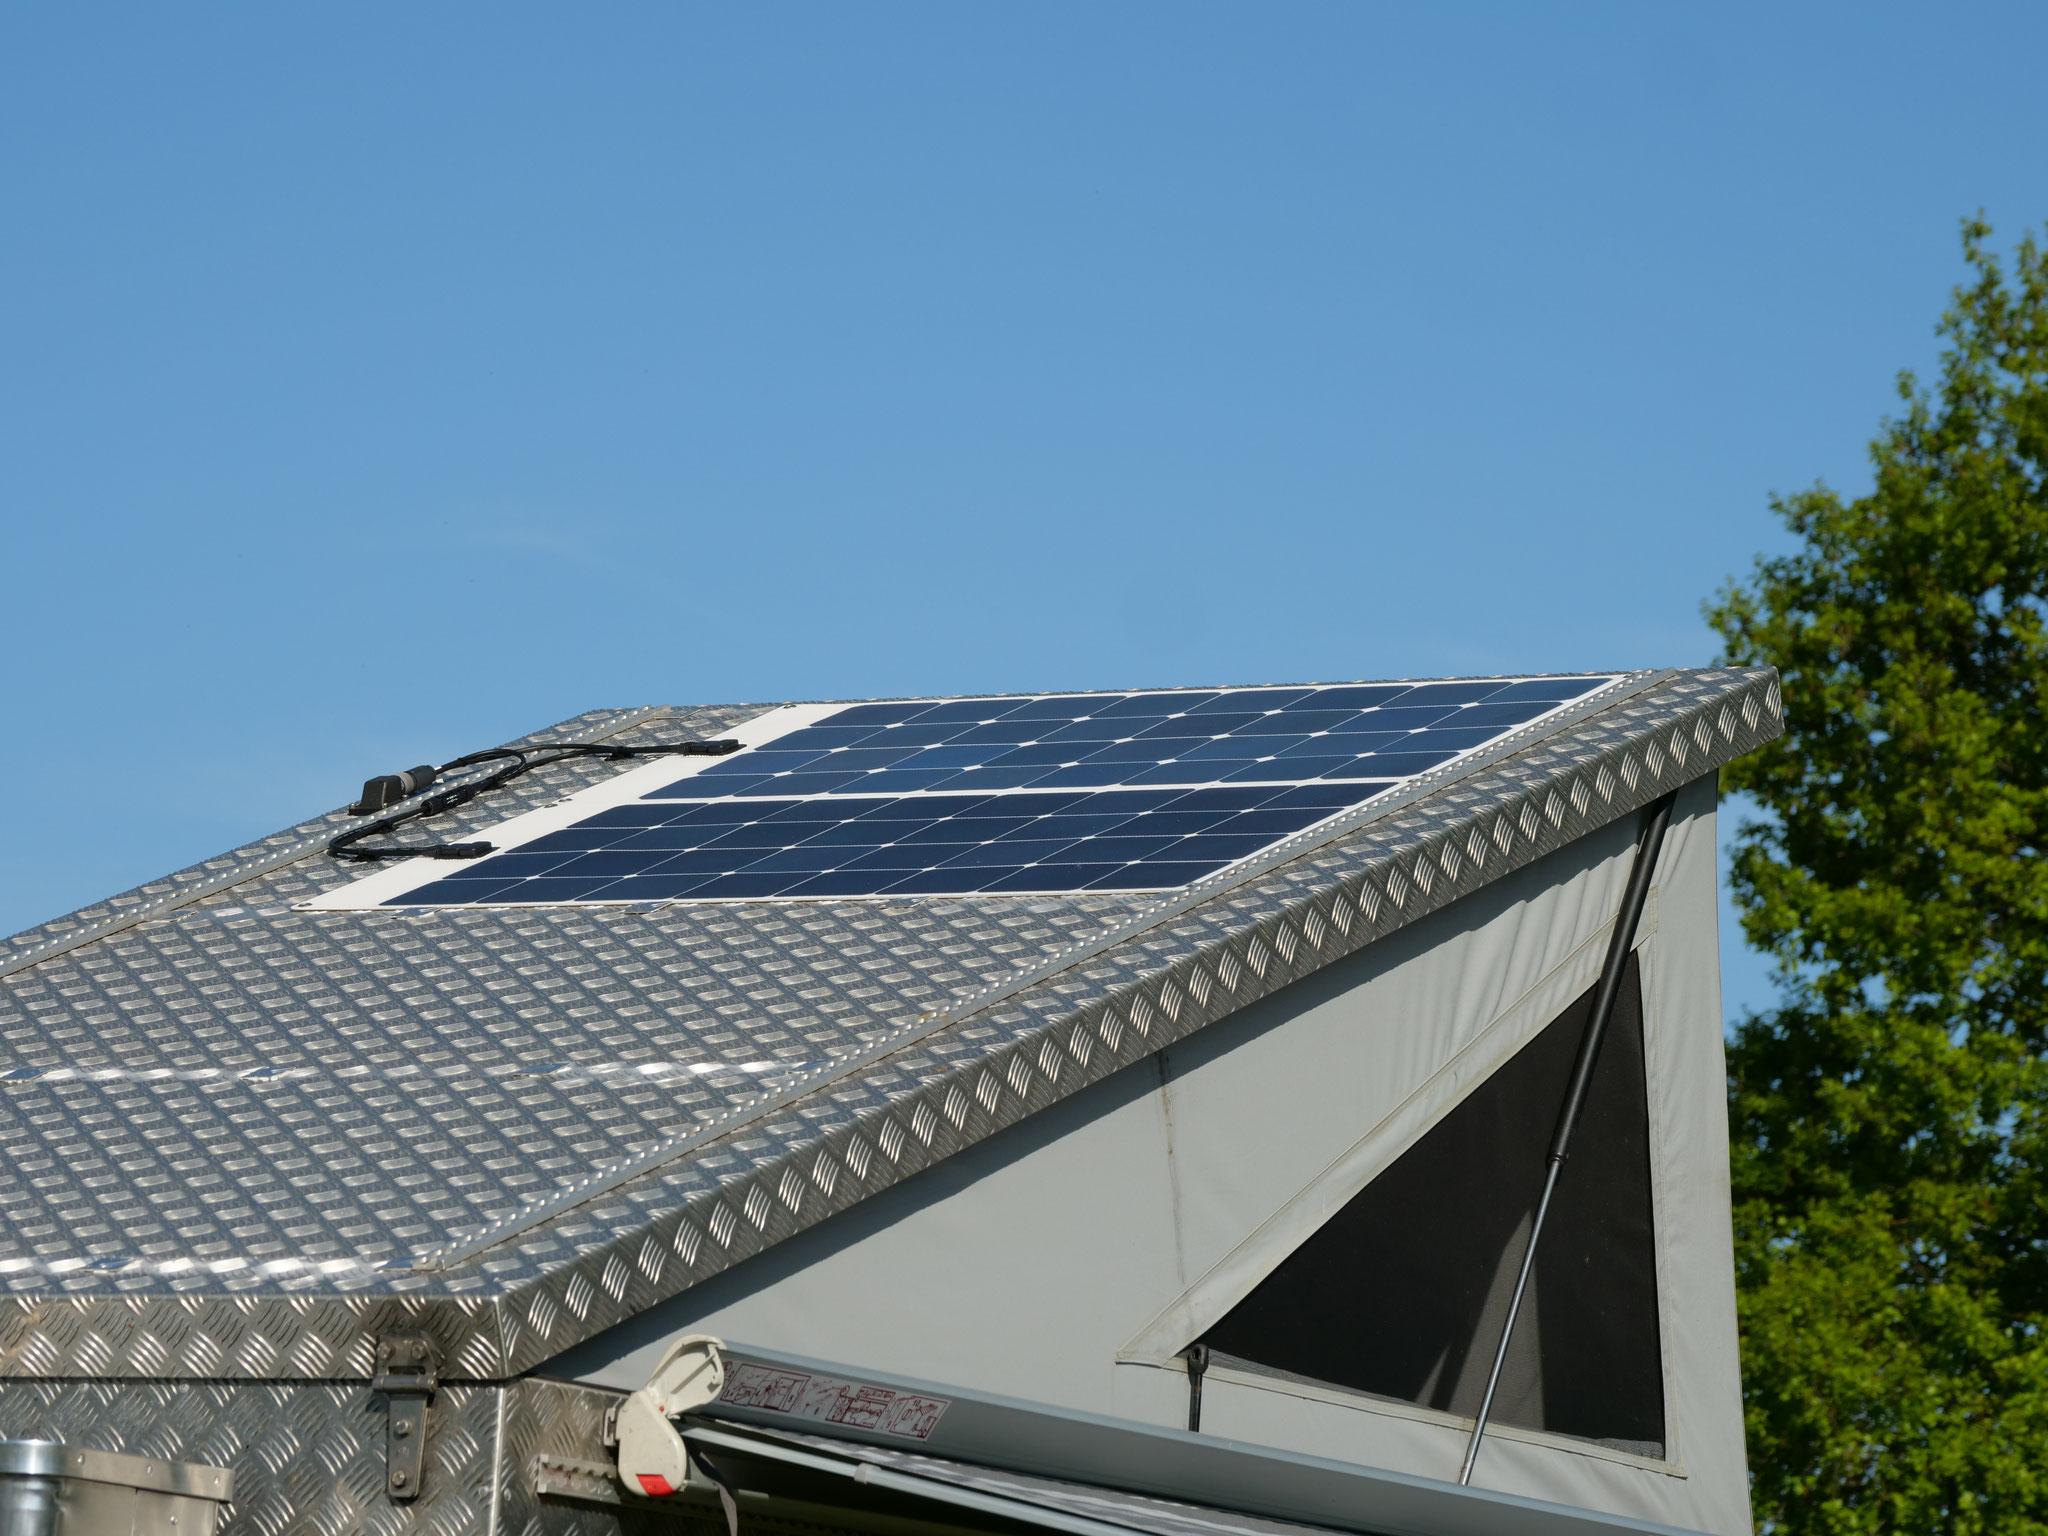 Toyota Hilux Revo 2017 2.4 #ProjektBlackwolf Solar Sunpower Victron 75/15 Ausbau Interieur Rako Schubladen Exkab 1 offroad Tacoma expedition overland wolf78-overland.ch